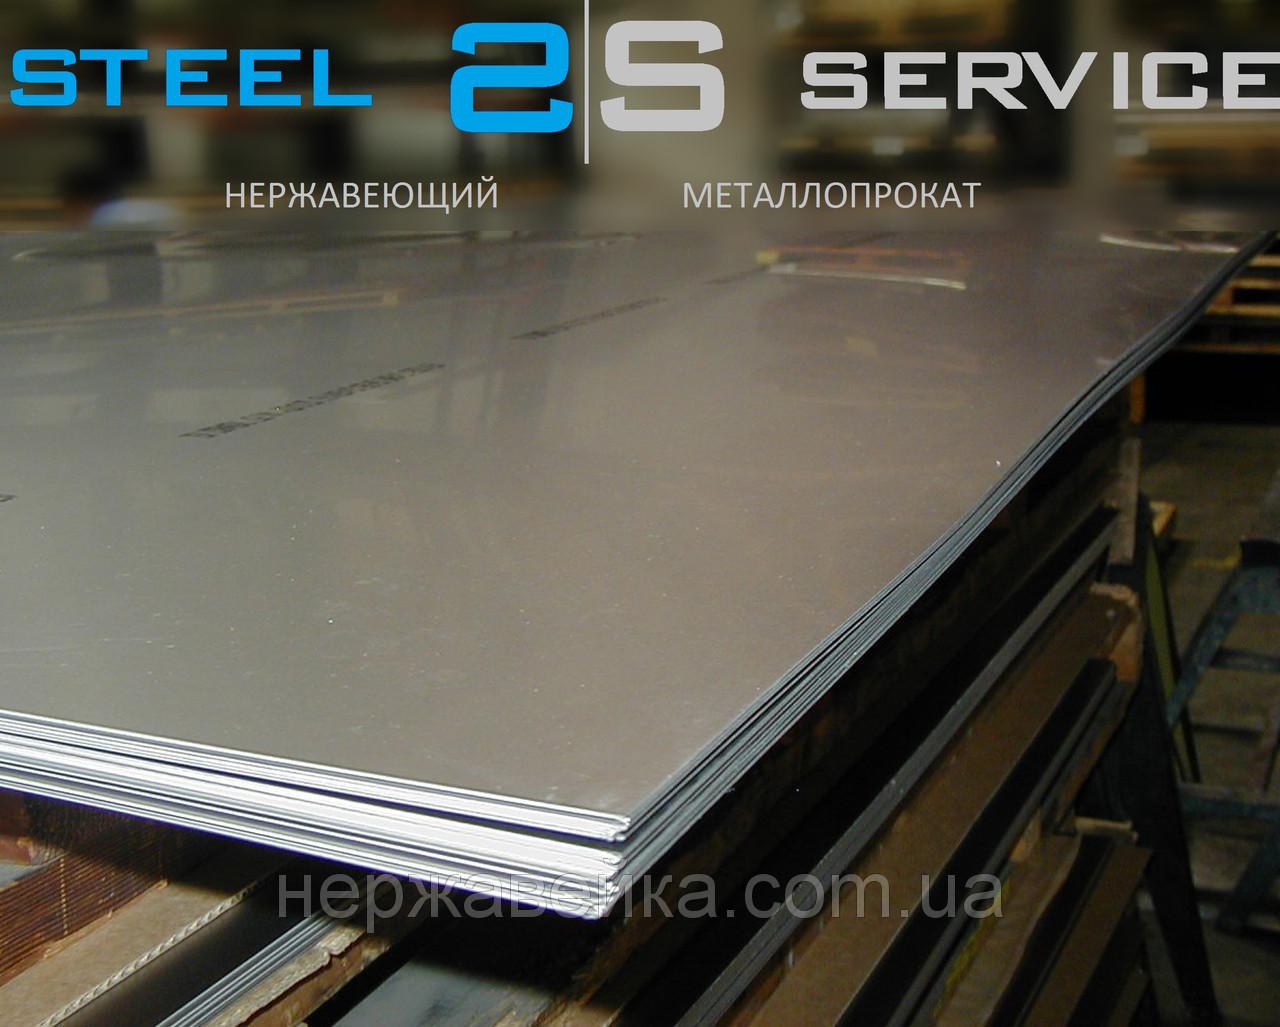 Листовая нержавейка 0,5х1250х2500мм AiSi 201  (12Х15Г9НД) 4N - шлифованный